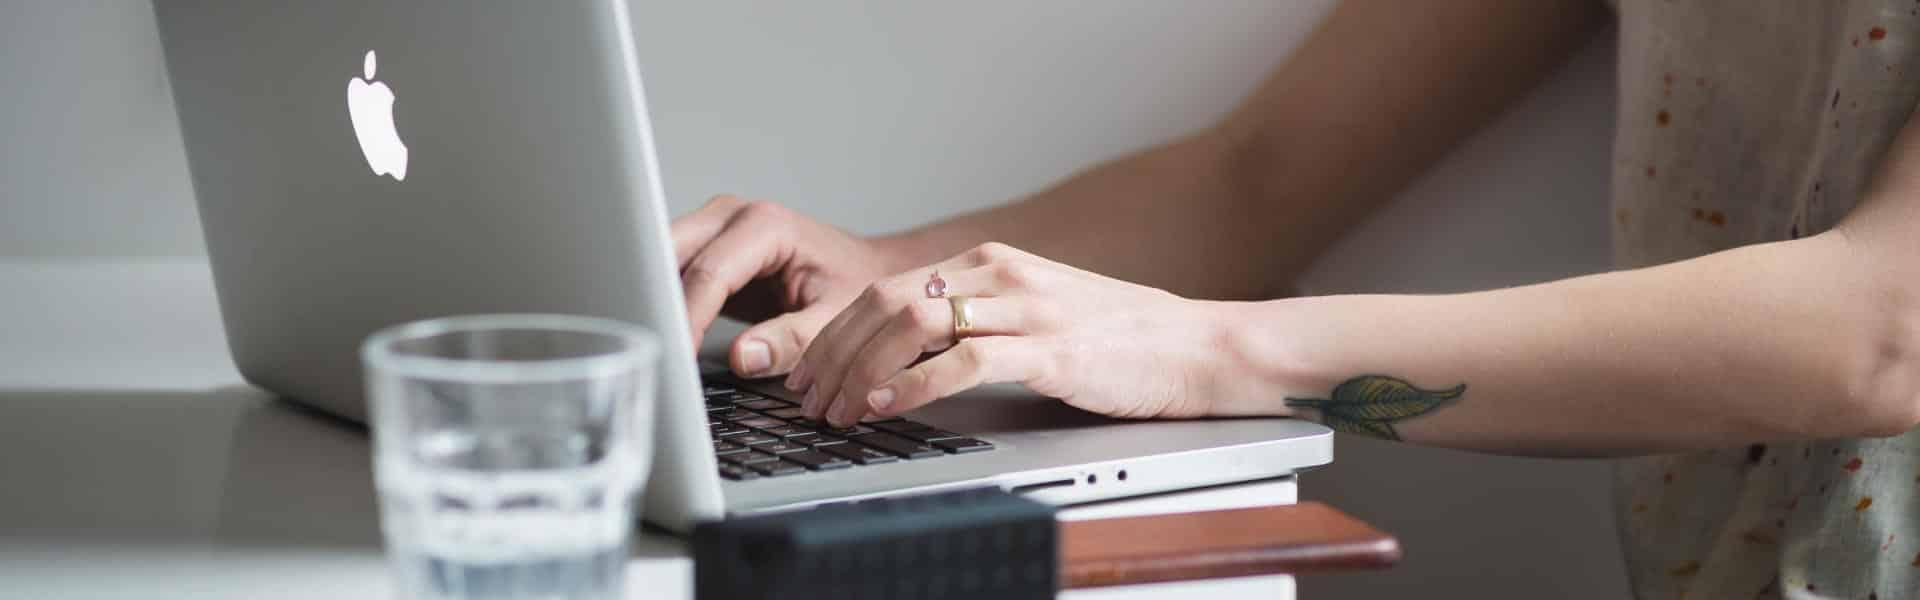 Zoekmachine-Marketing-Search-engine-marketing-SEA-Adverteren